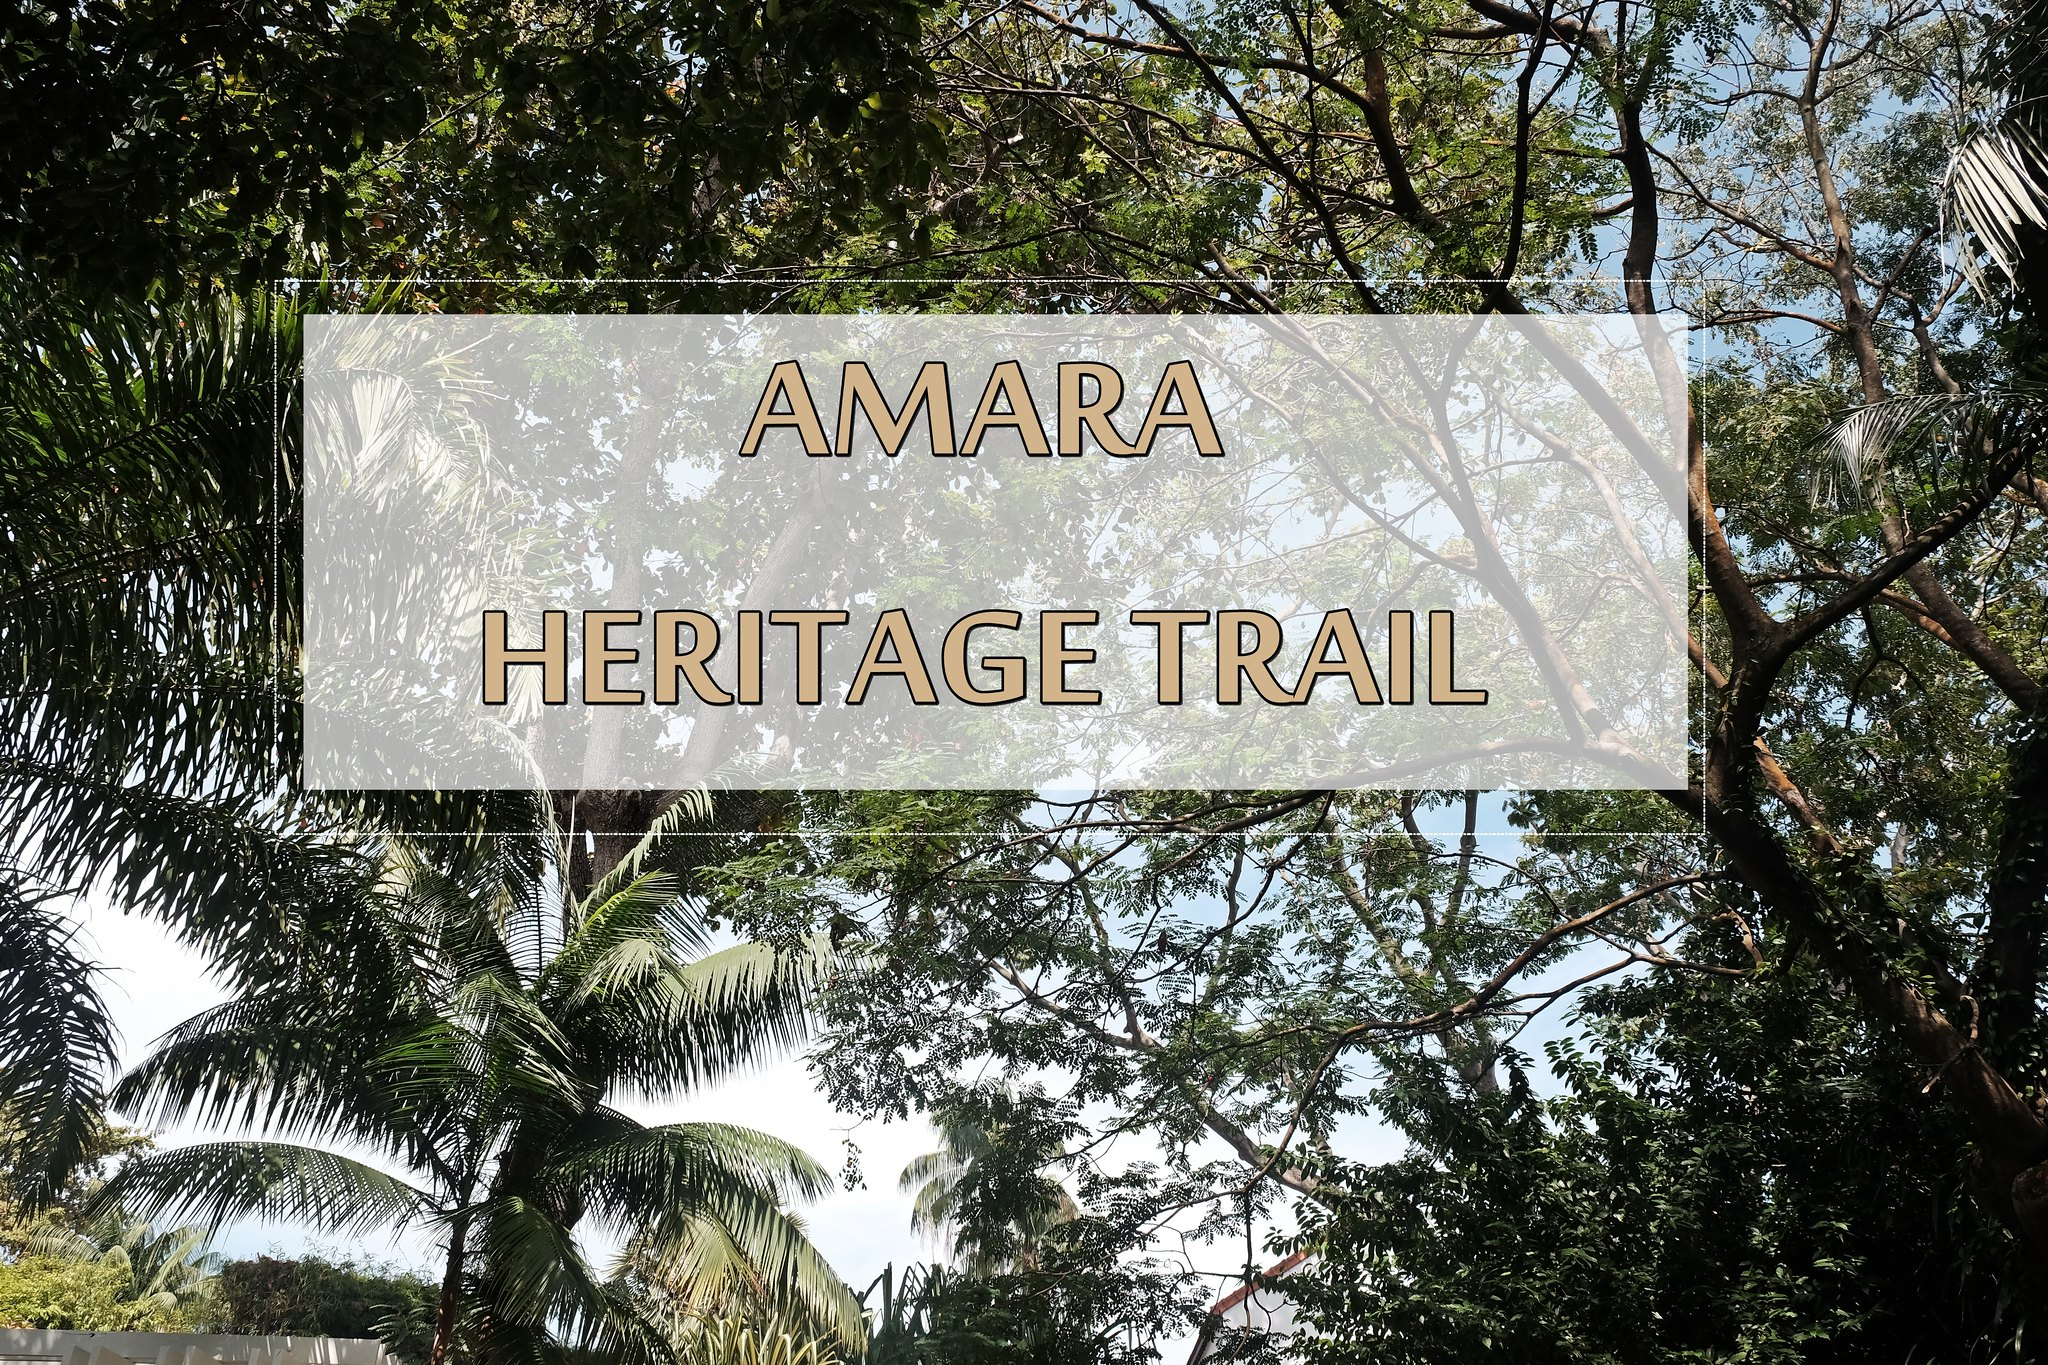 [SG TRAVELS] AMARA Sanctuary Resort Sentosa Heritage Trail – A Glimpse of The History of British Colonial Days & Sentosa Singapore